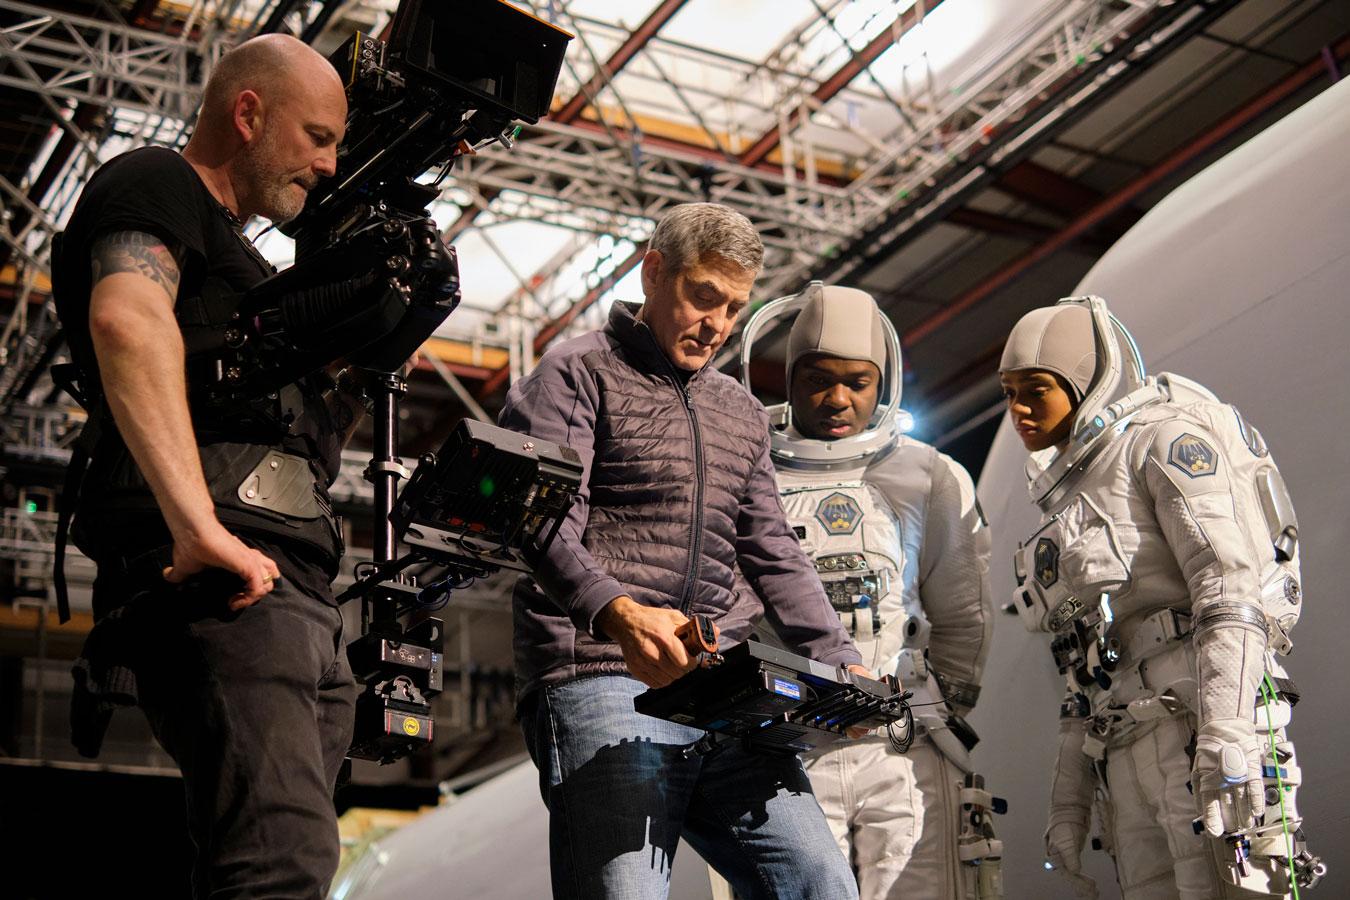 George Clooney 'Cielo de Medianoche' Netflix